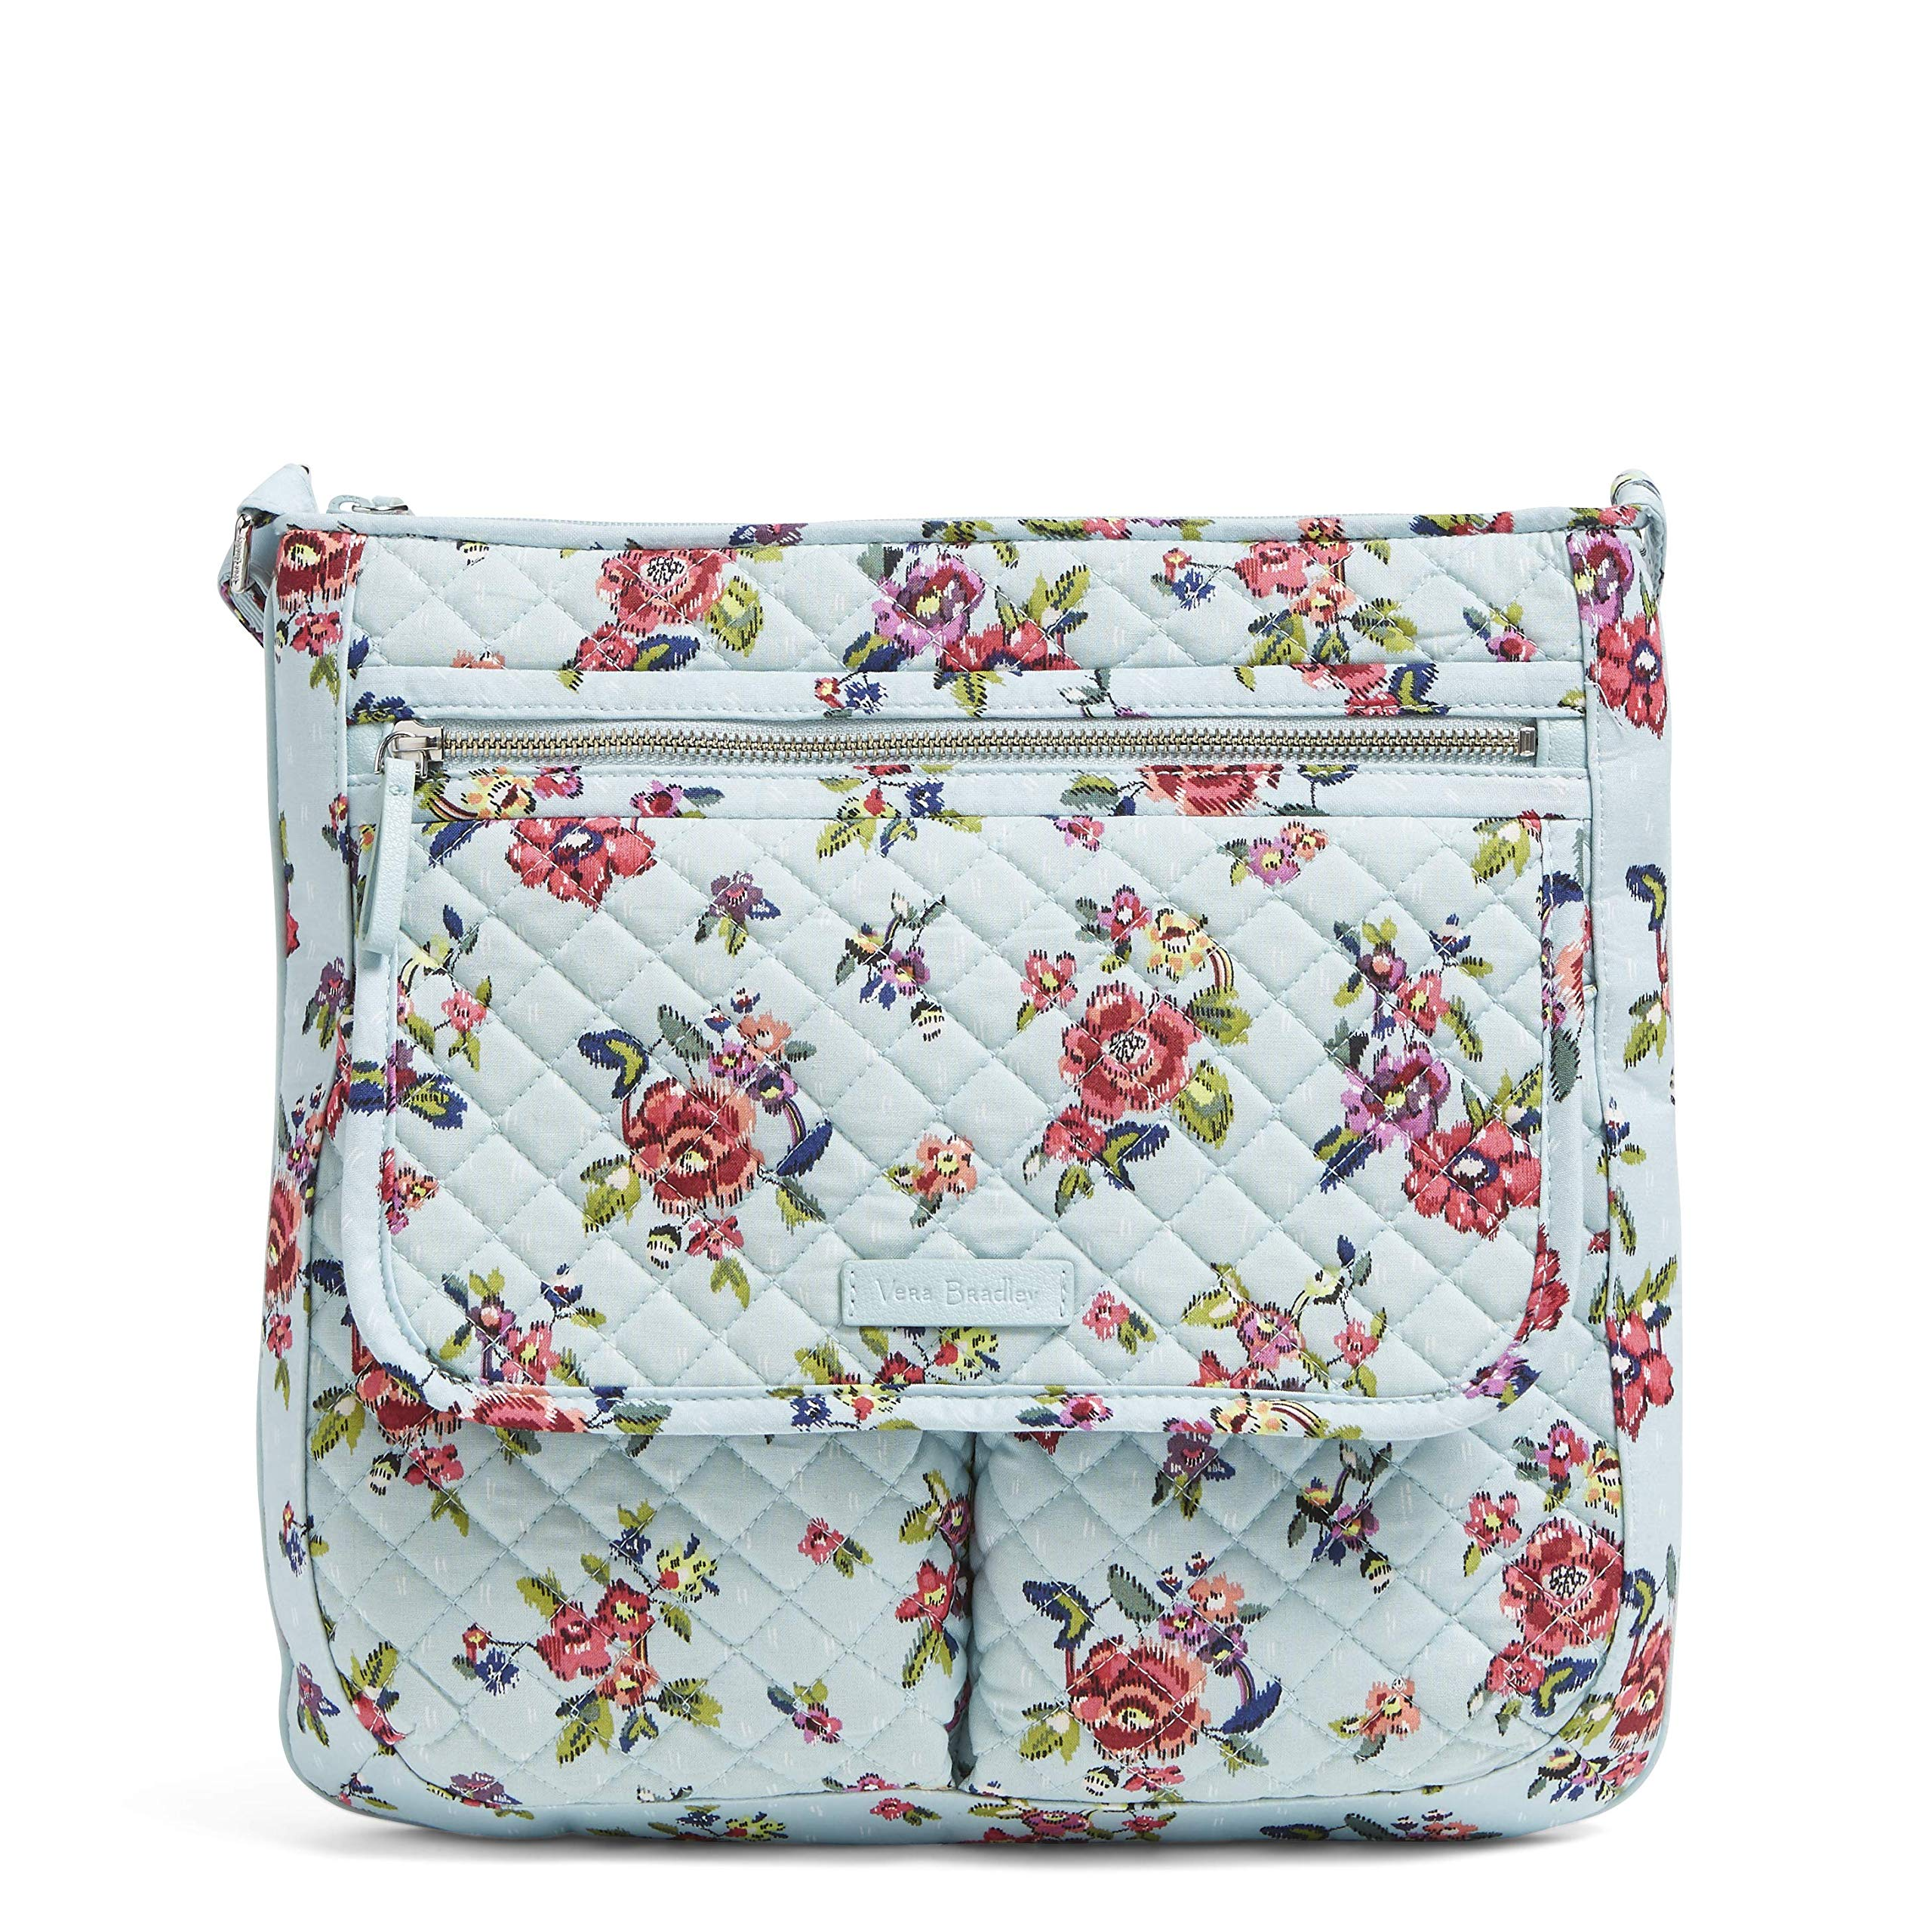 Vera Bradley Iconic Mailbag, Signature Cotton, water bouquet